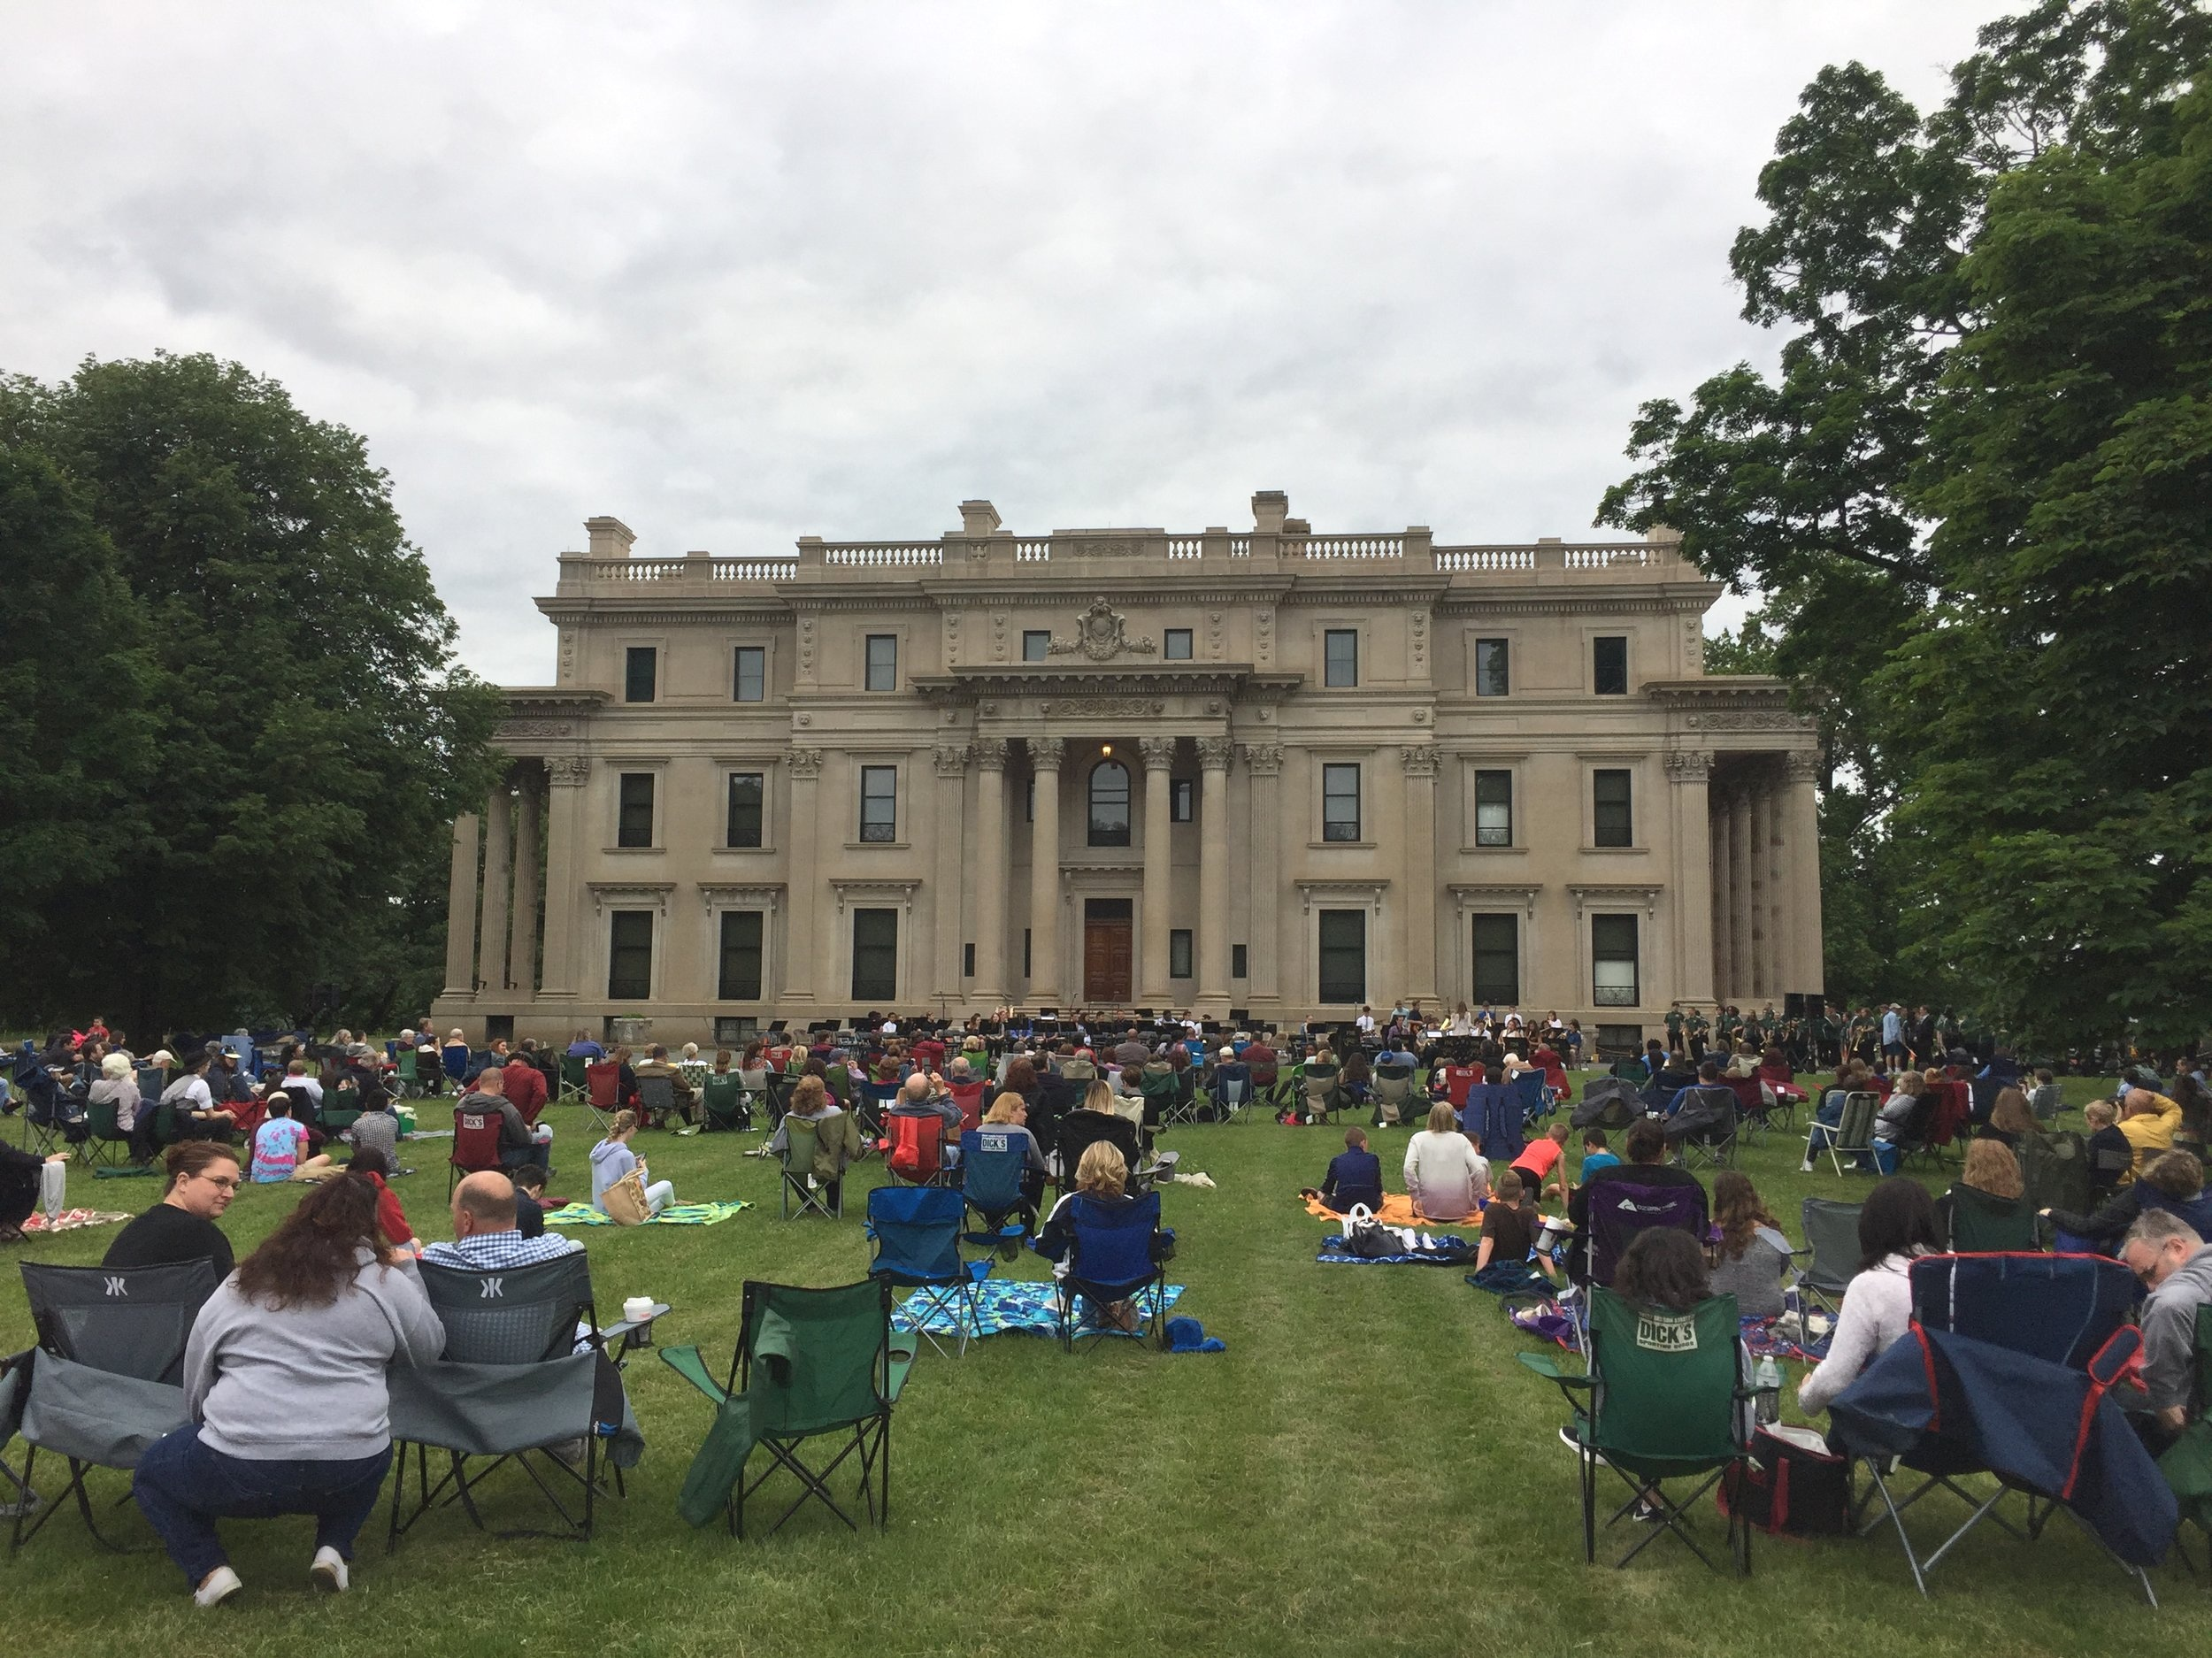 Music in the Parks_Vanderbilt_2018_N_DeLawder.JPG